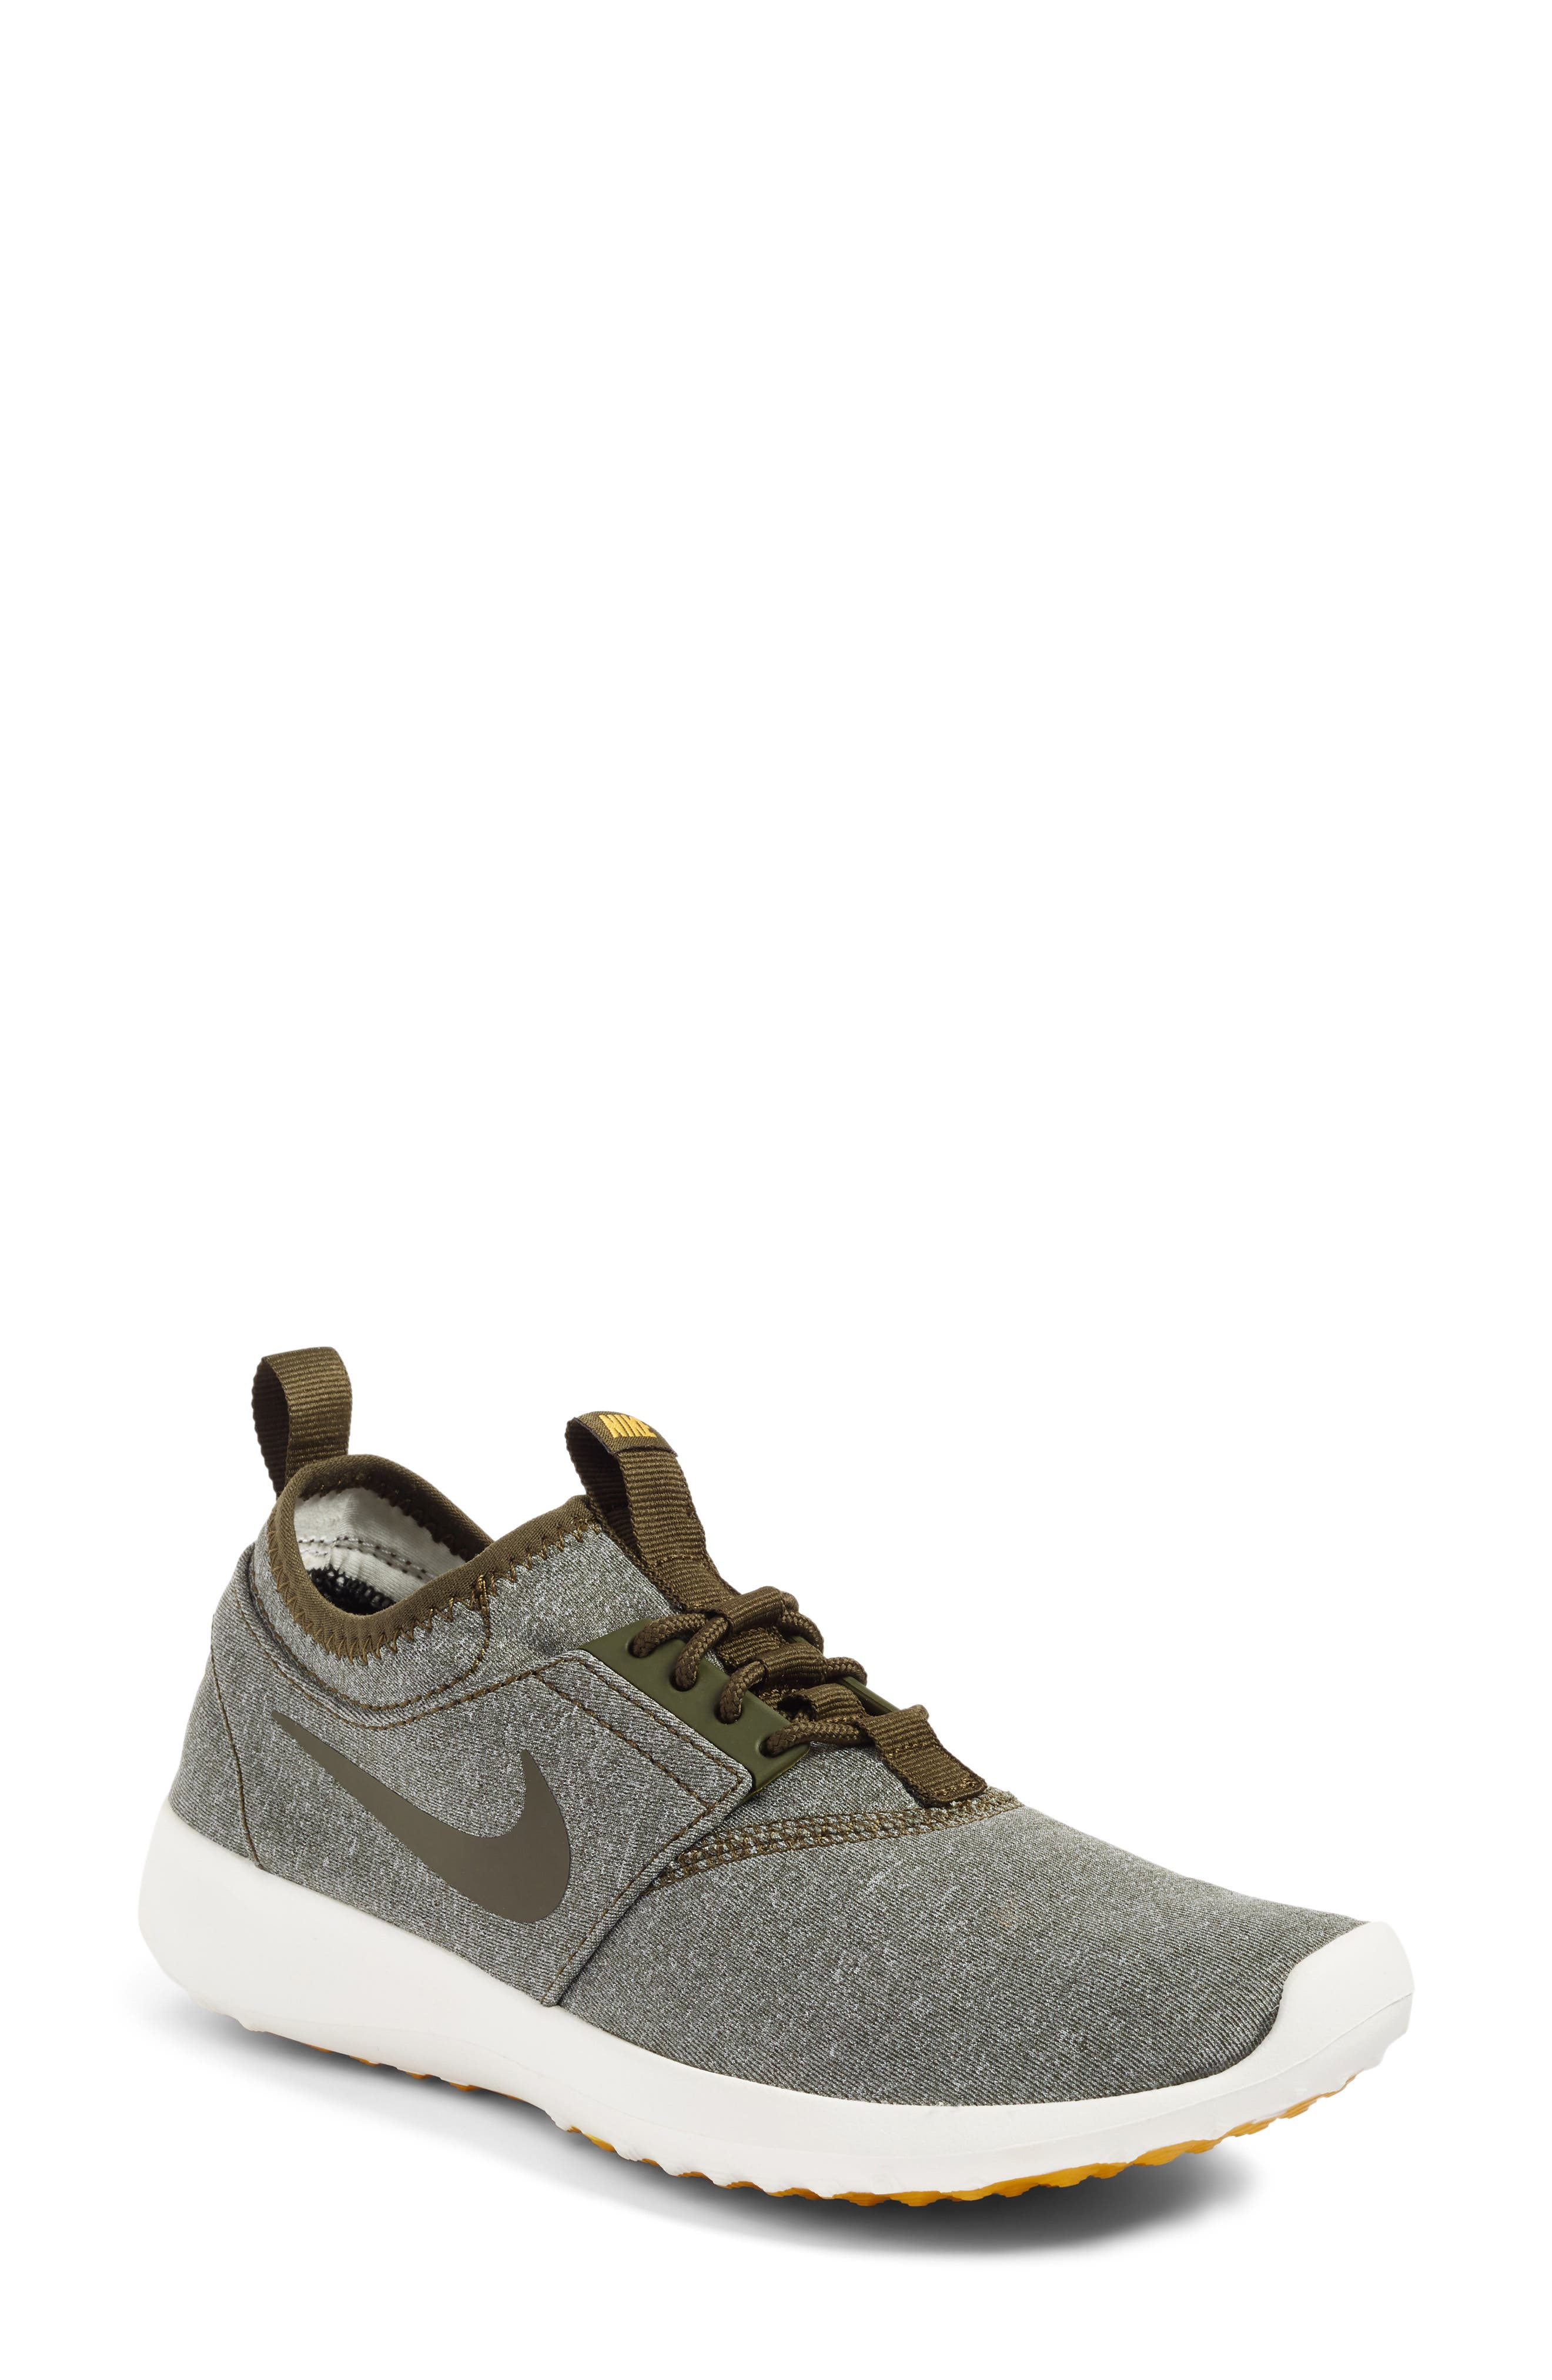 Juvenate SE Sneaker,                             Alternate thumbnail 21, color,